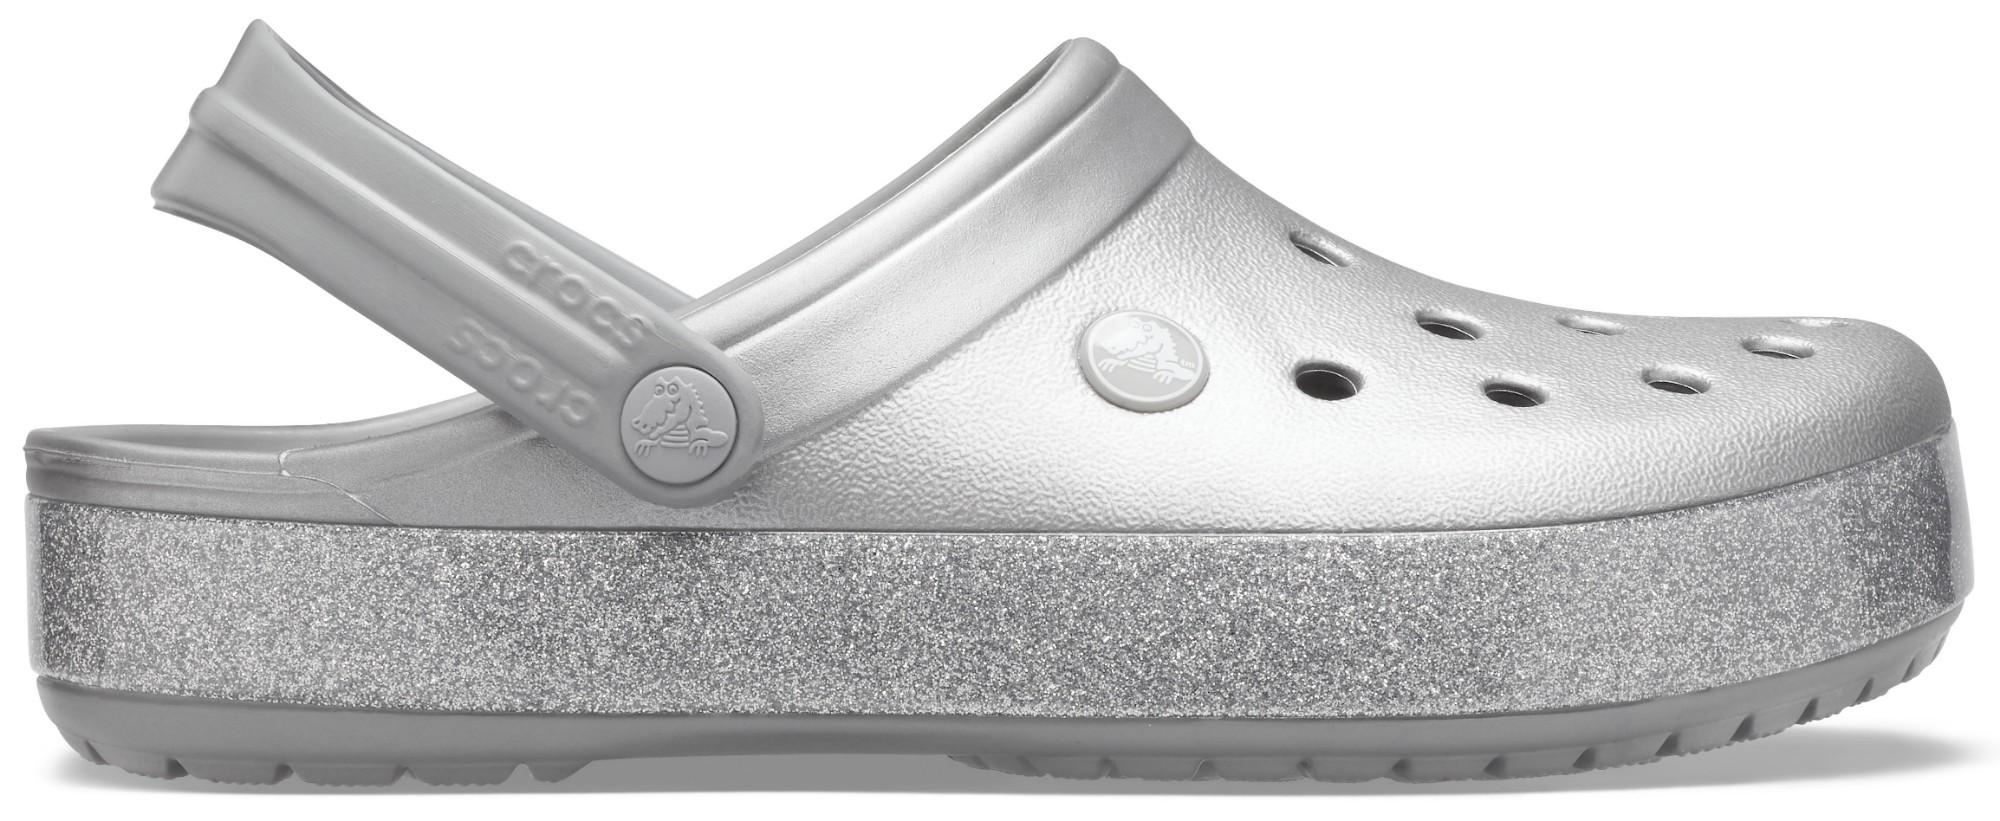 Crocs™ Crocband Printed Clog Metallic Silver 36,5